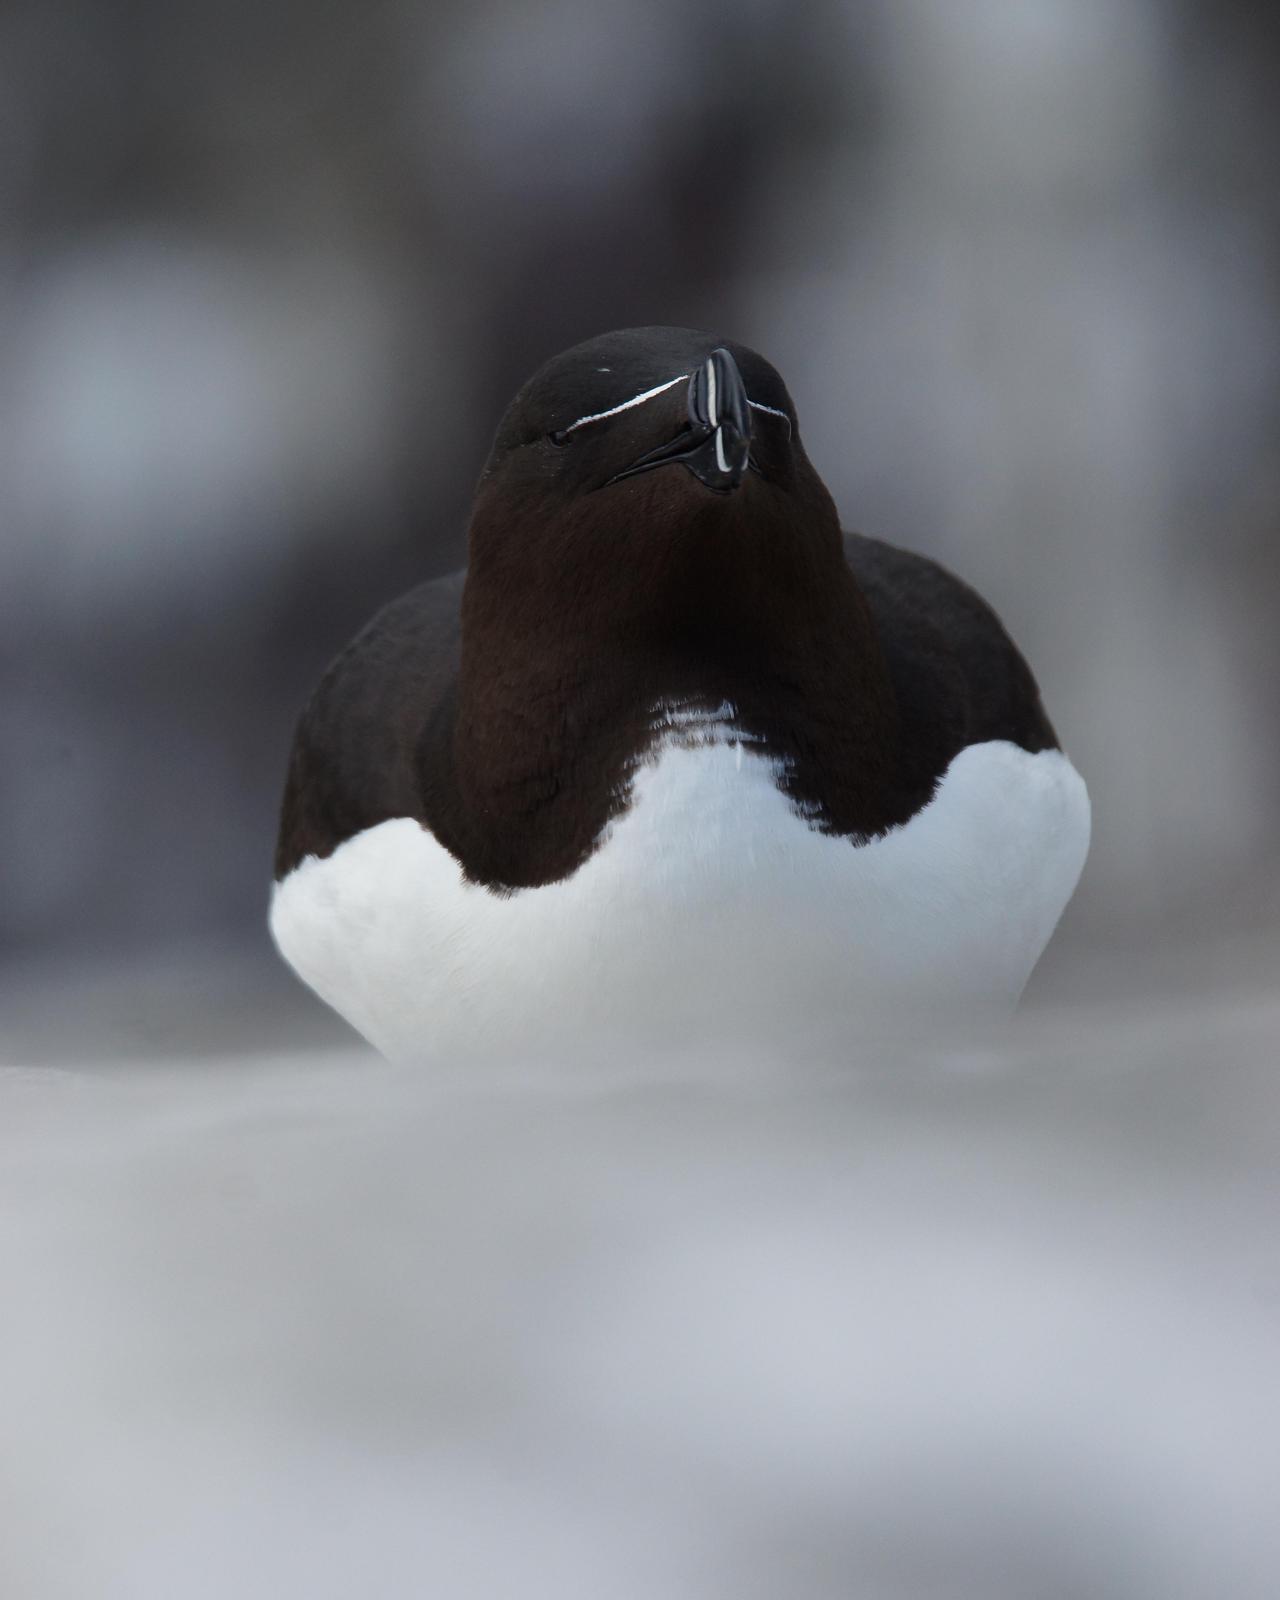 Razorbill Photo by Steve Percival